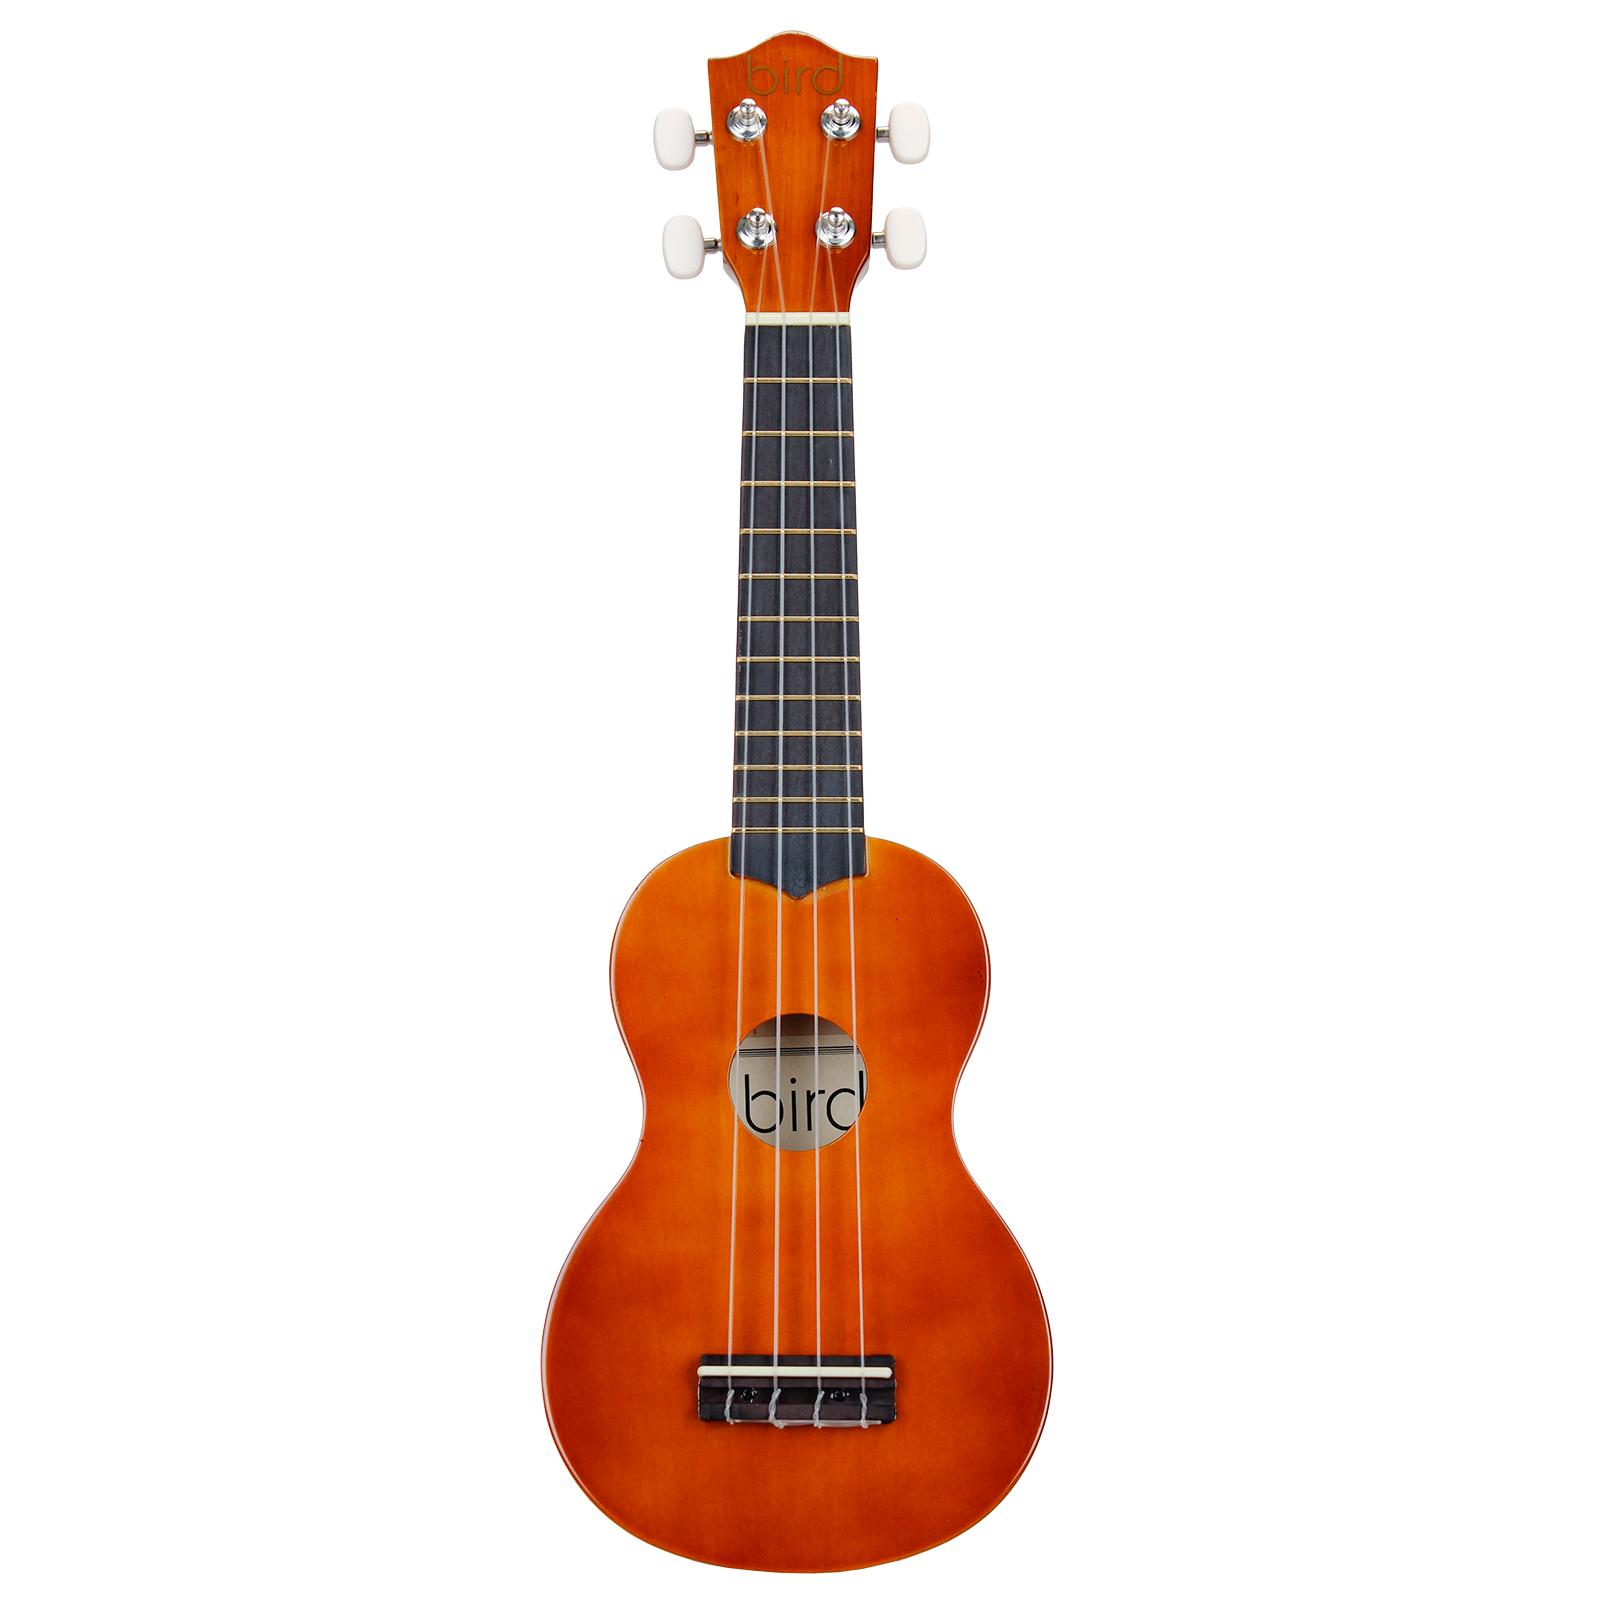 brighton uk1s nl soprano ukulele buy online free. Black Bedroom Furniture Sets. Home Design Ideas